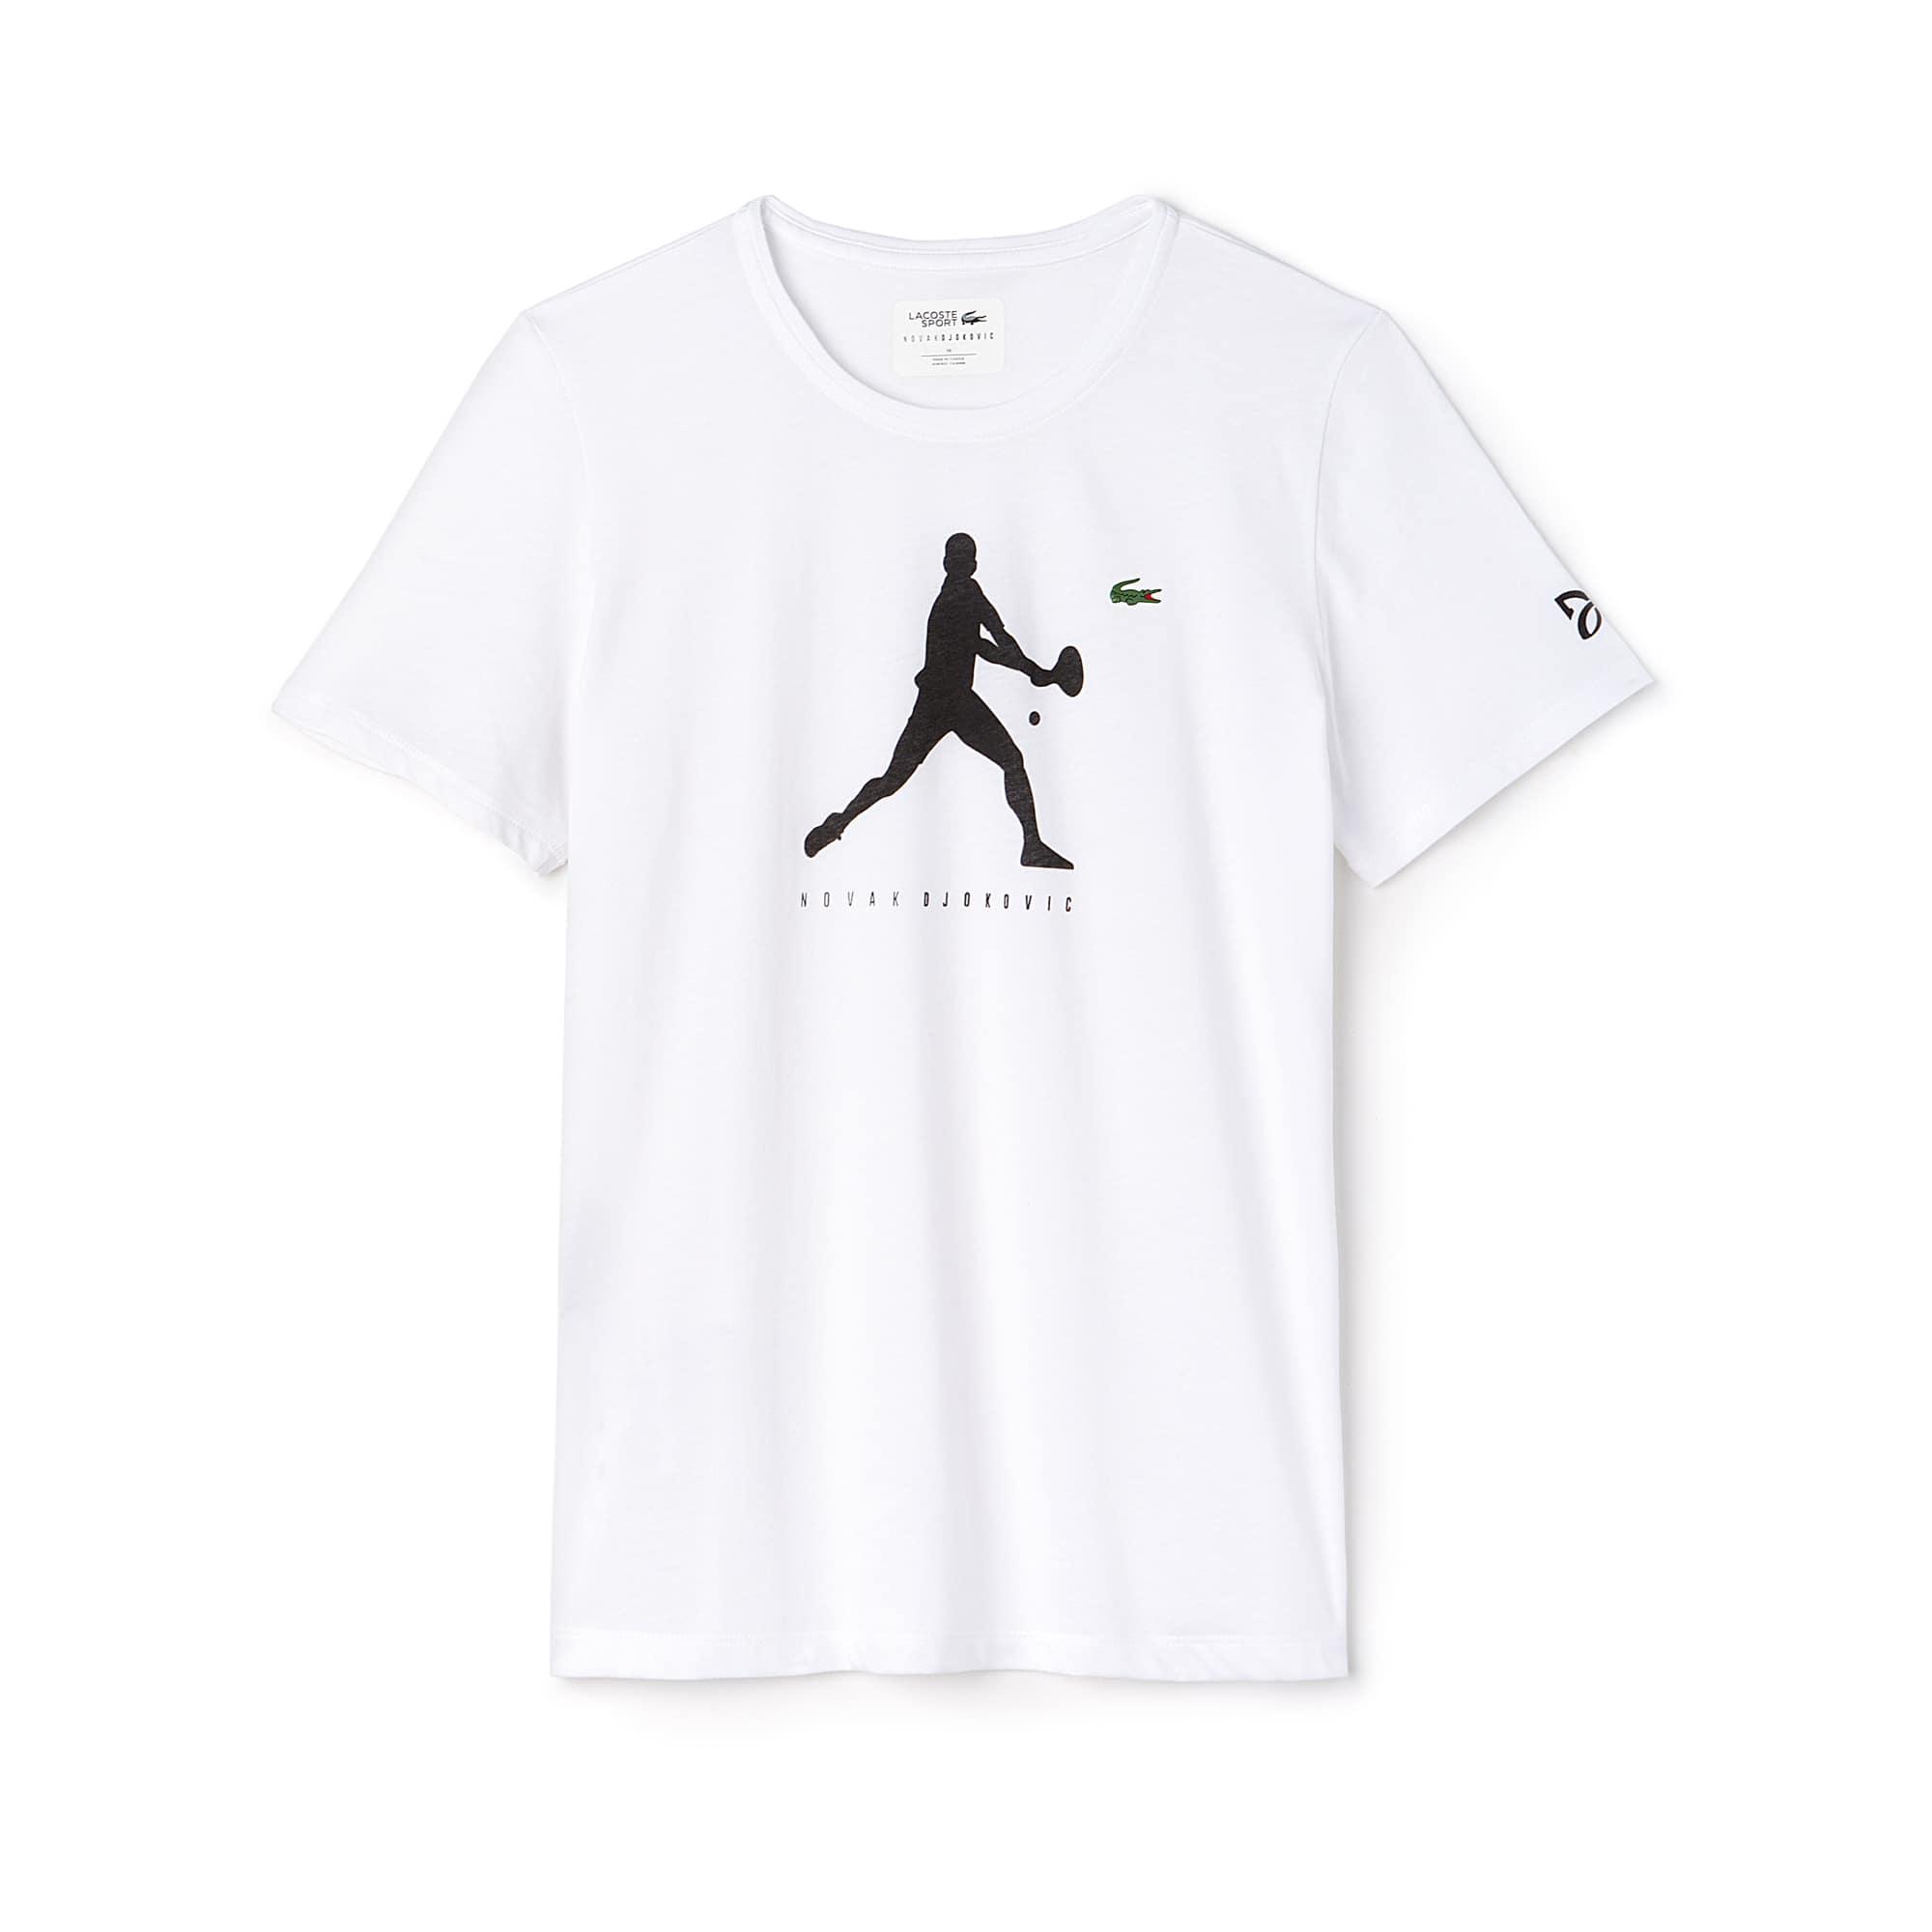 Camiseta cuello redondo Lacoste SPORT COLLECTION NOVAK DJOKOVIC SUPPORT WITH STYLE de punto jersey liso con estampado